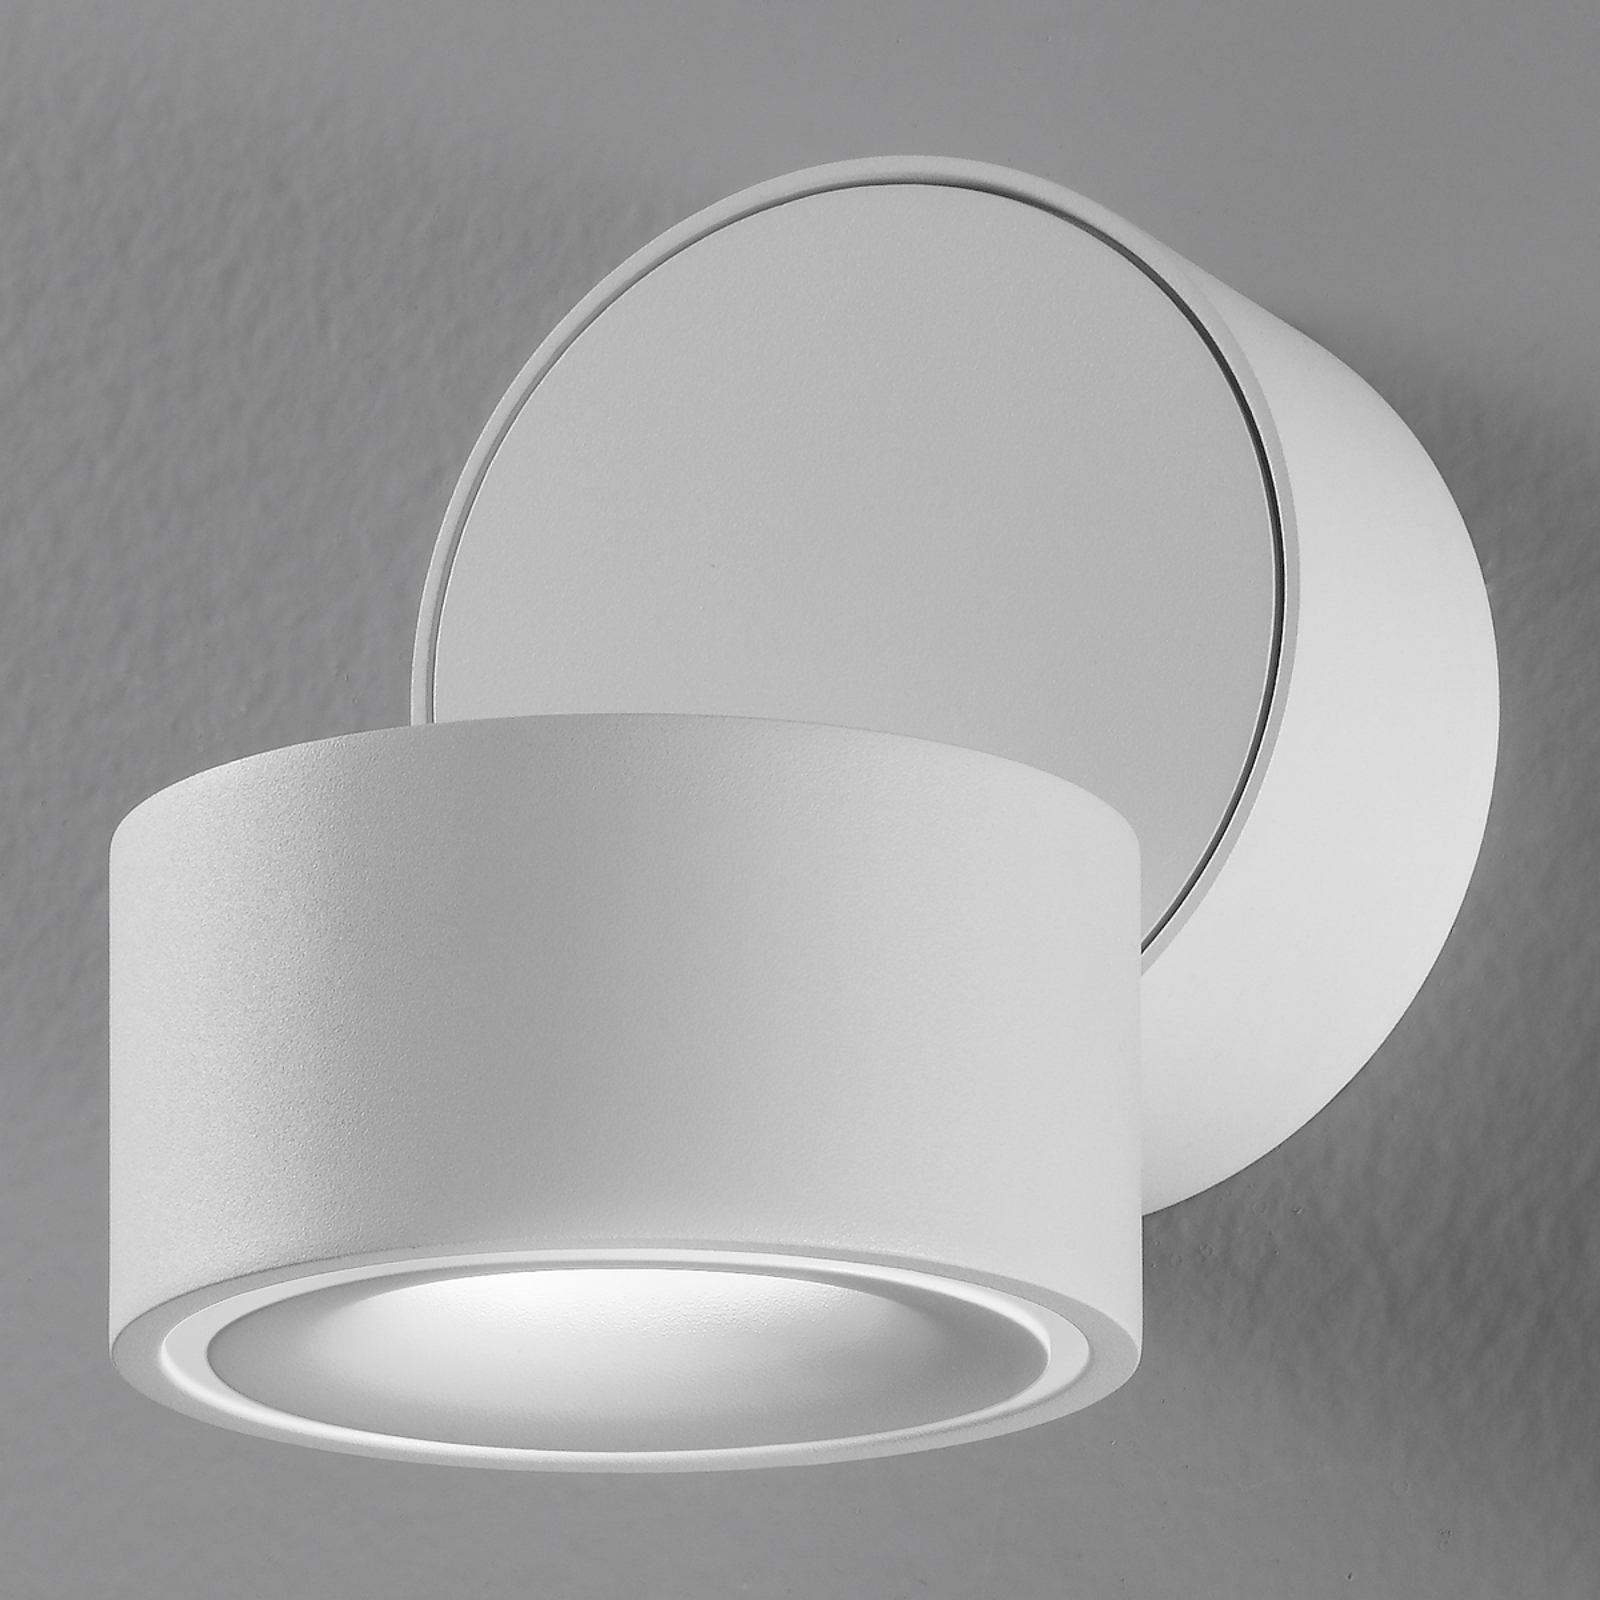 Dreh- und schwenkbarer LED-Strahler Clippo